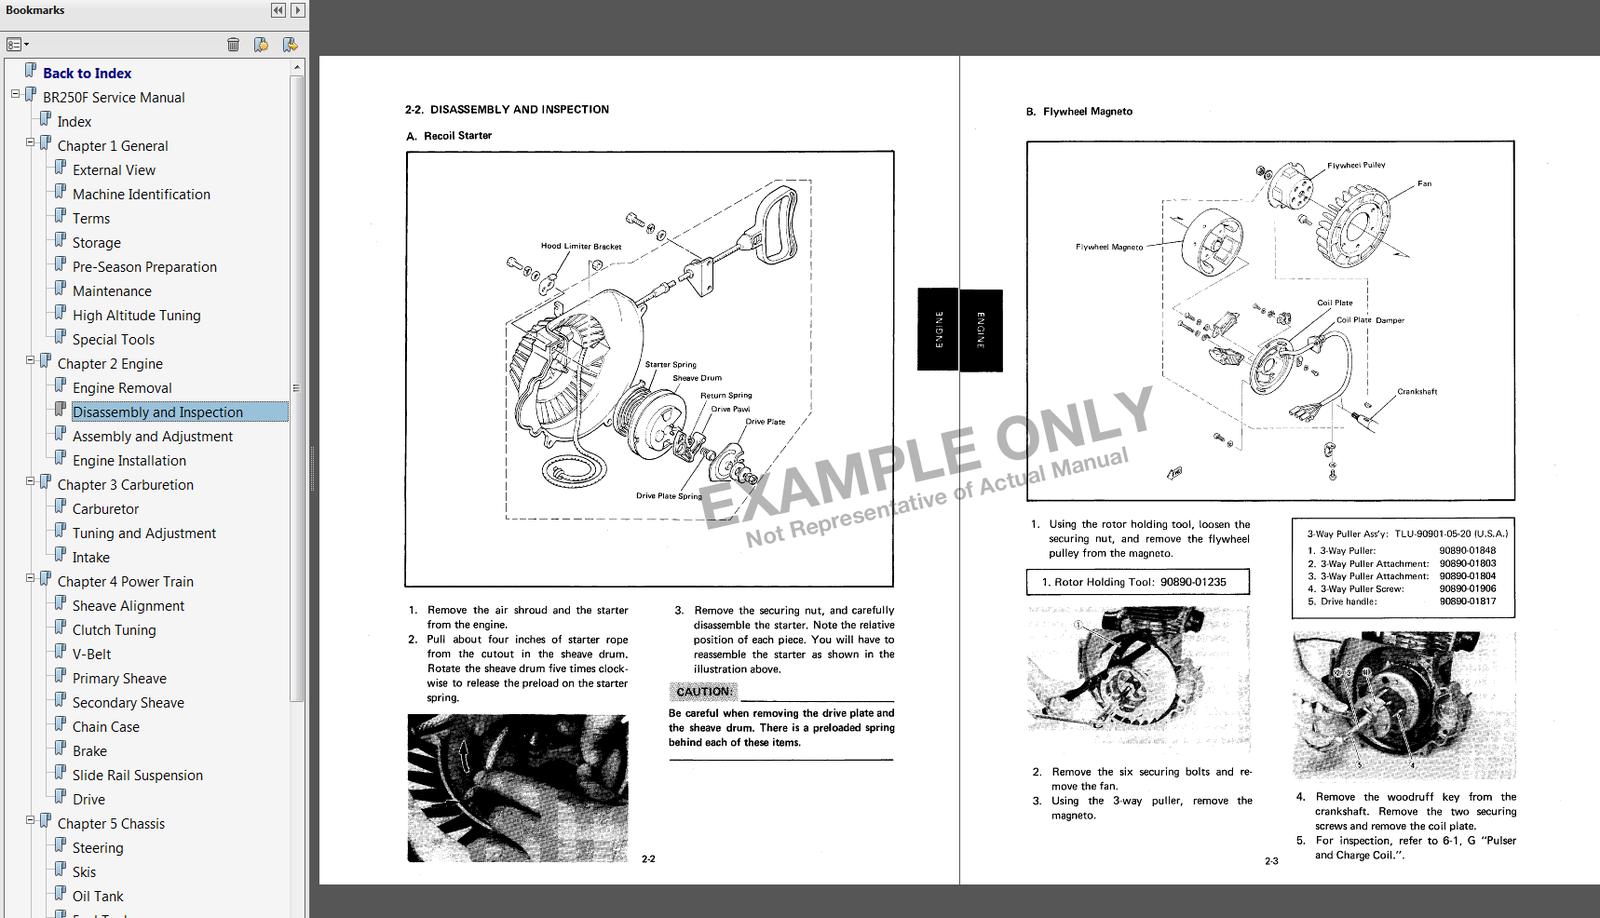 Wiring Diagram Yamaha Srv Reinvent Your Atv Schematics 1982 1991 Snowmobile Service And 50 Similar Items Rh Bonanza Com